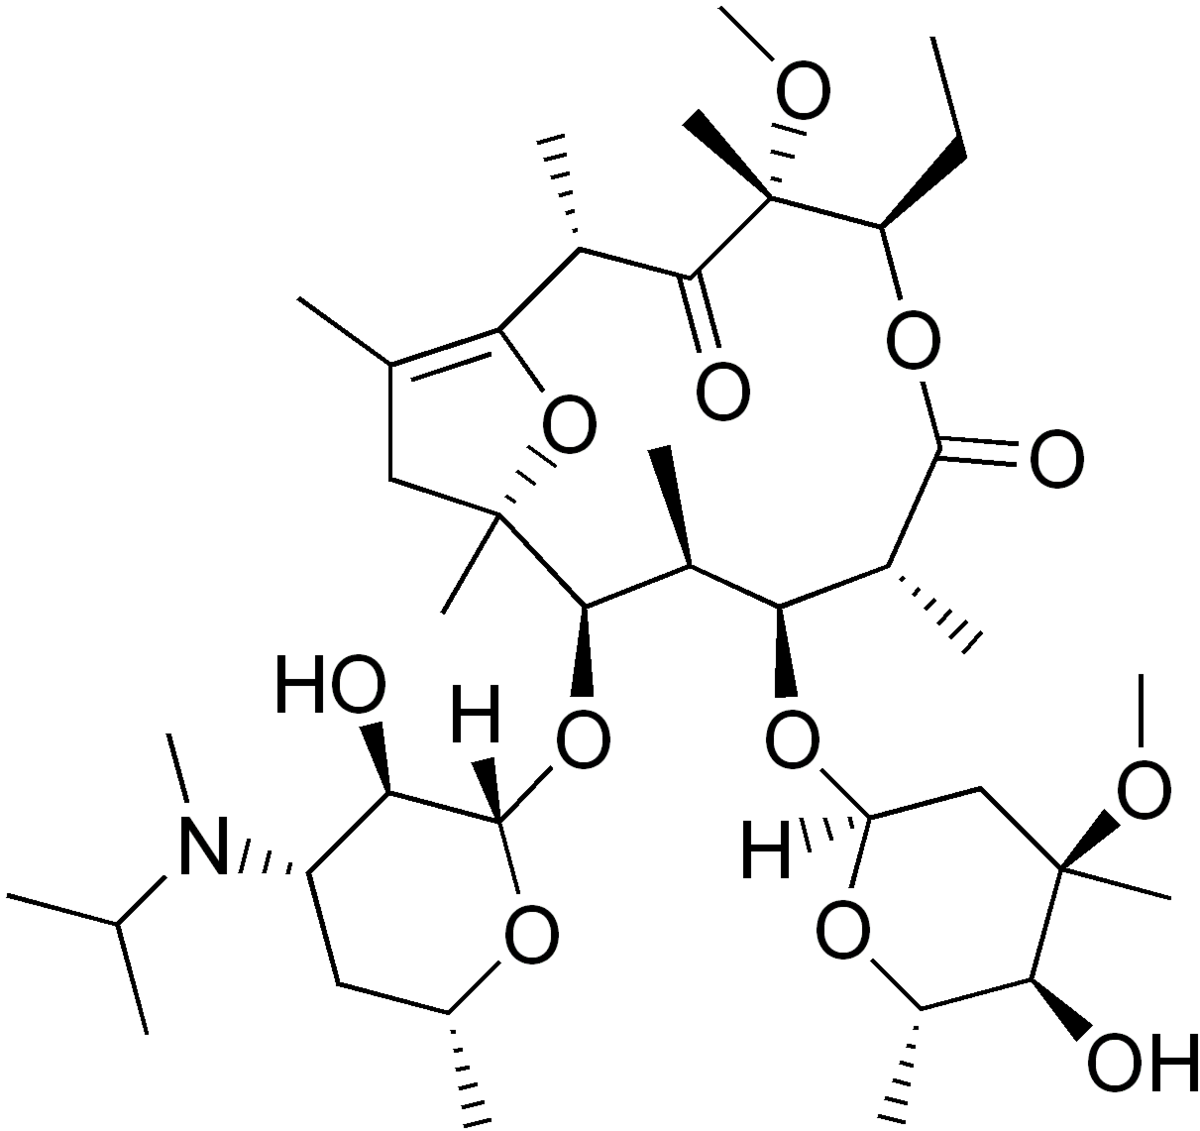 Mitemcinal - Wikipedia